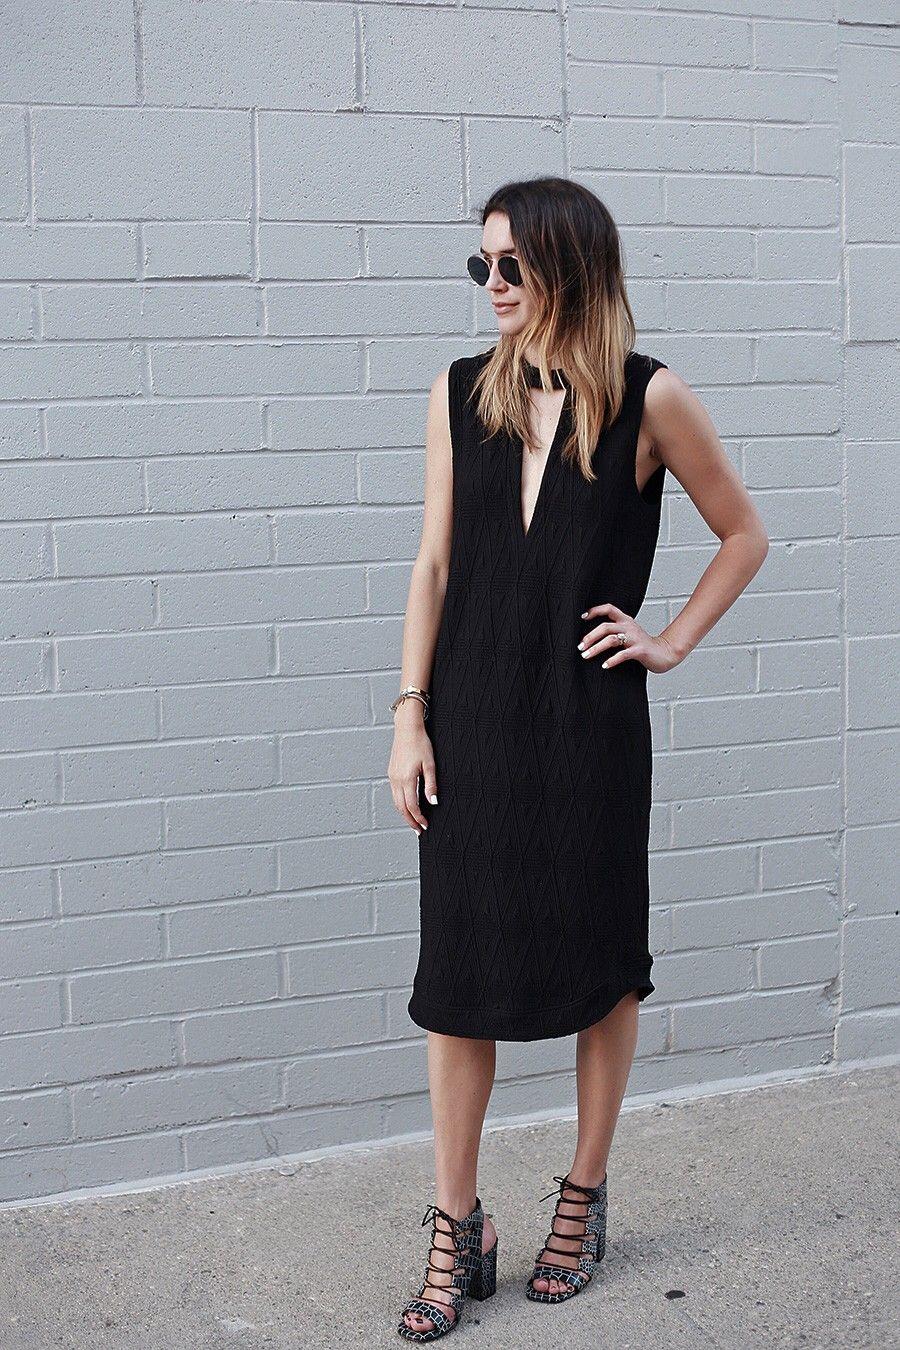 Shift Dress and Lace Ups   Black shift dresses, Senso and Block heels